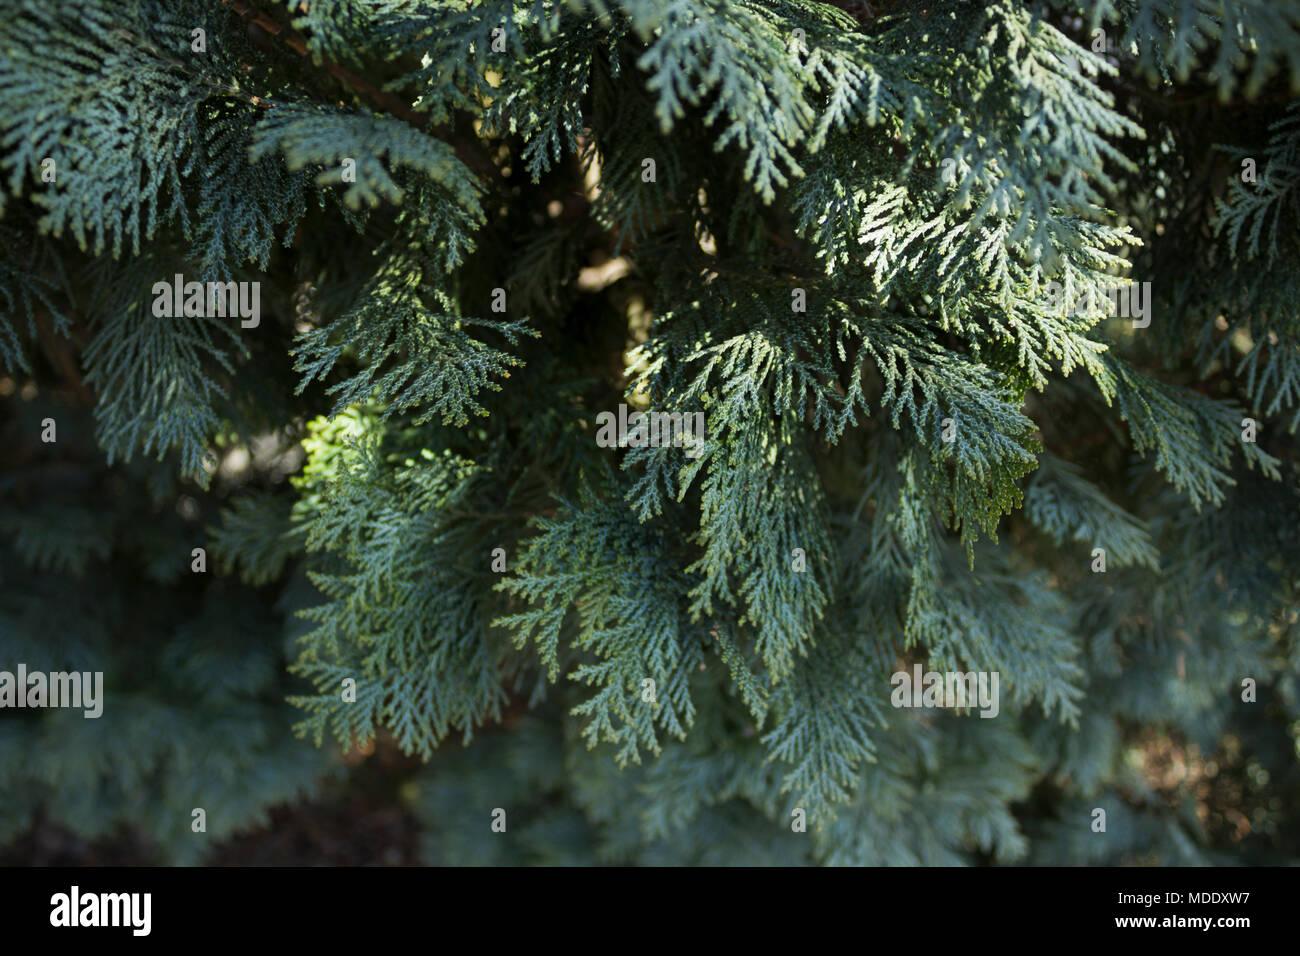 Close up of white cedar bush, almost grey in color. In Sweden. - Stock Image